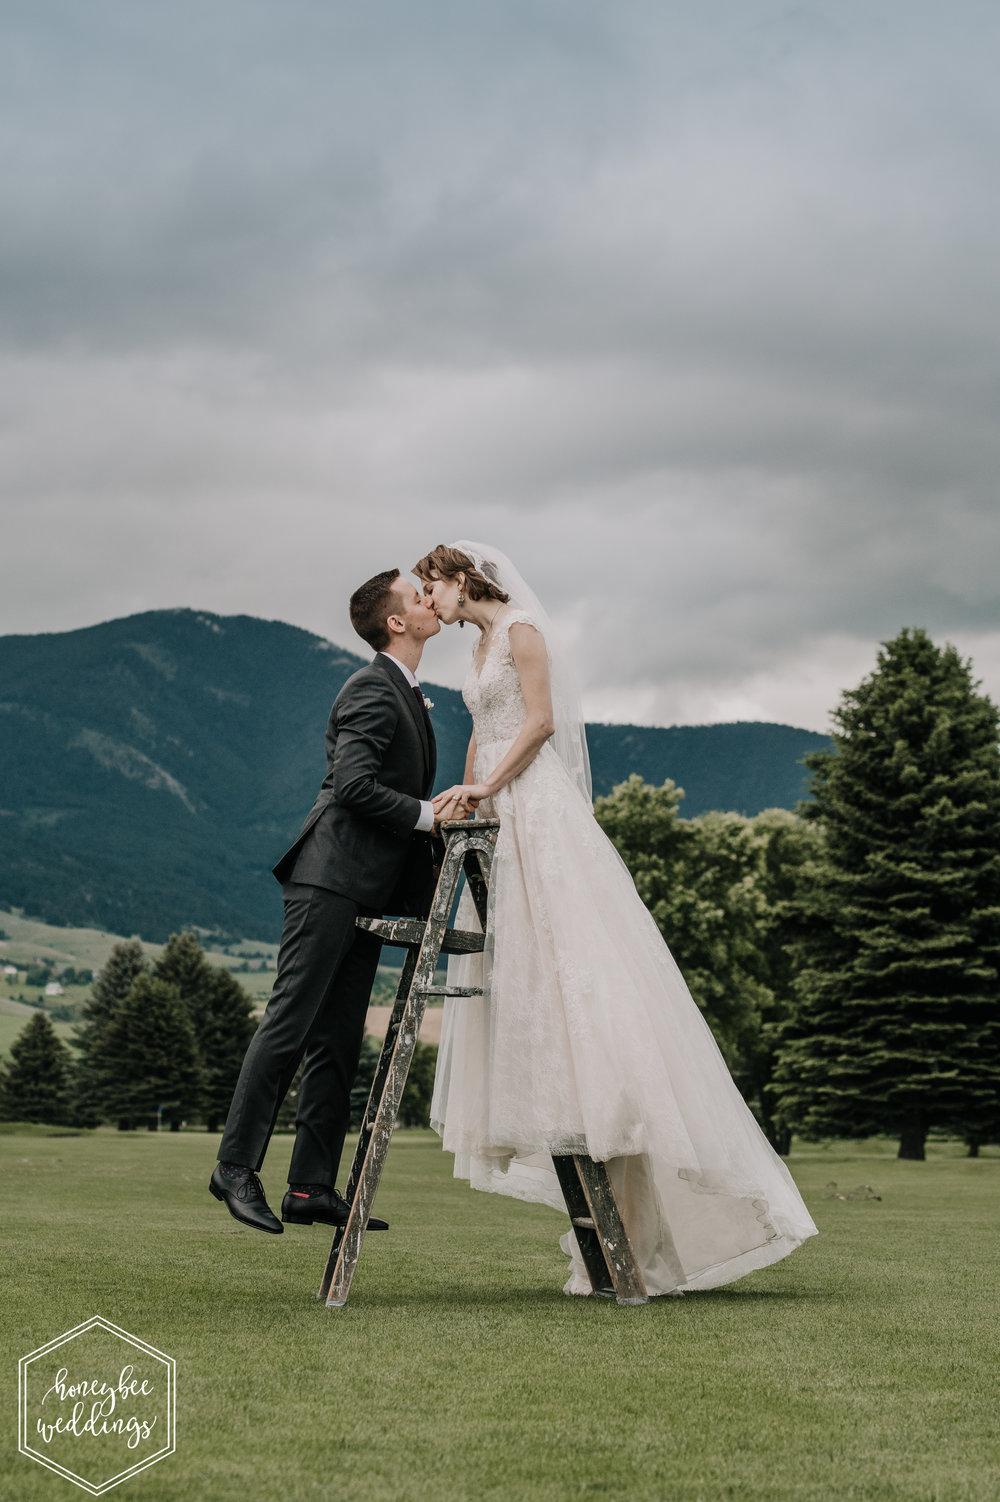 816 Riverside Country Club Wedding_Montana Wedding Photographer_Lauren Jackson + Evan Ivaldi 2018-7118.jpg